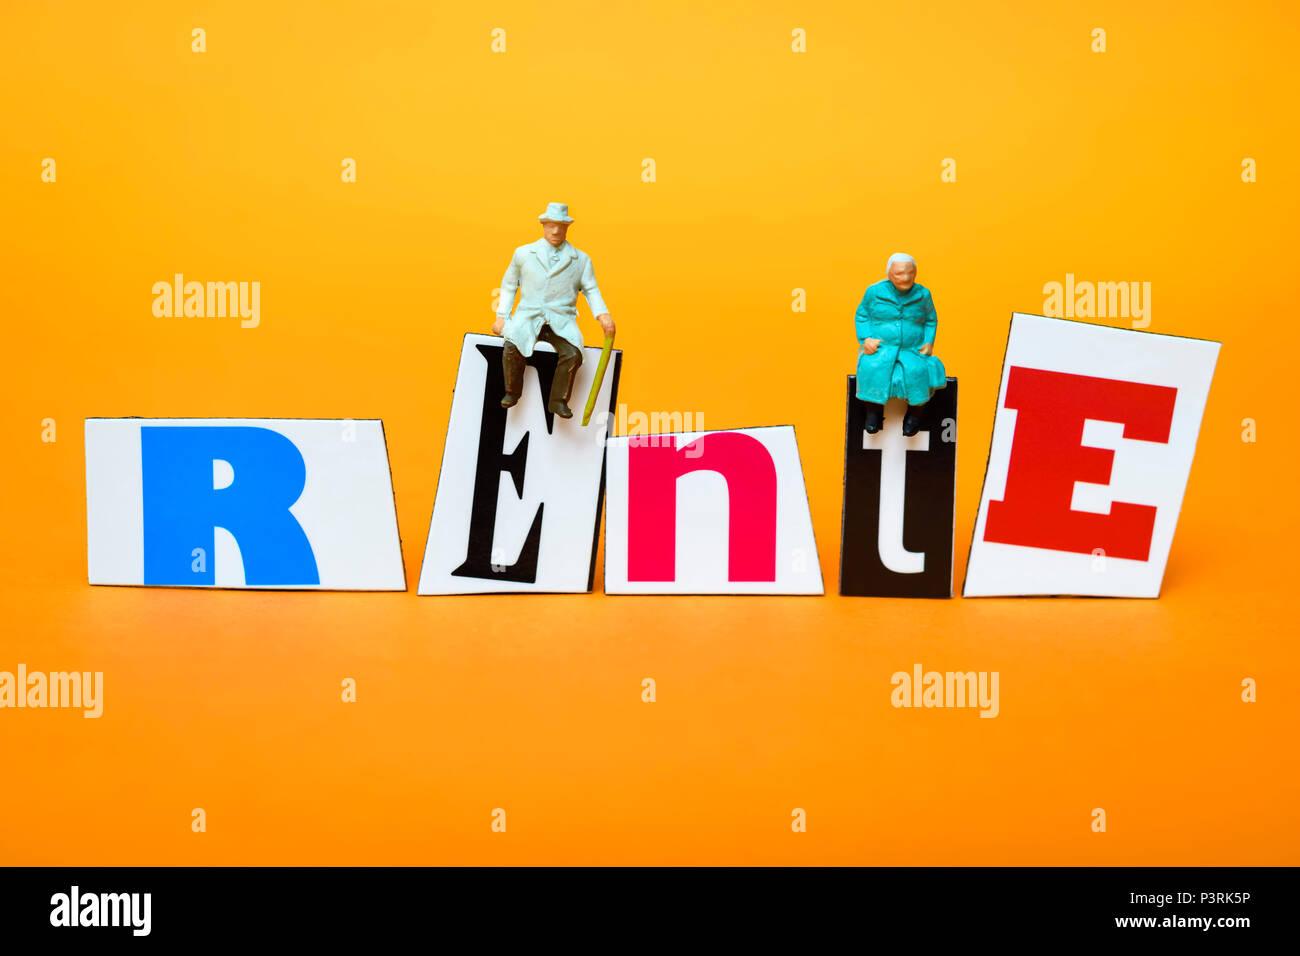 Miniature figures on the lettering Pension, Miniaturfiguren auf dem Schriftzug Rente Stock Photo